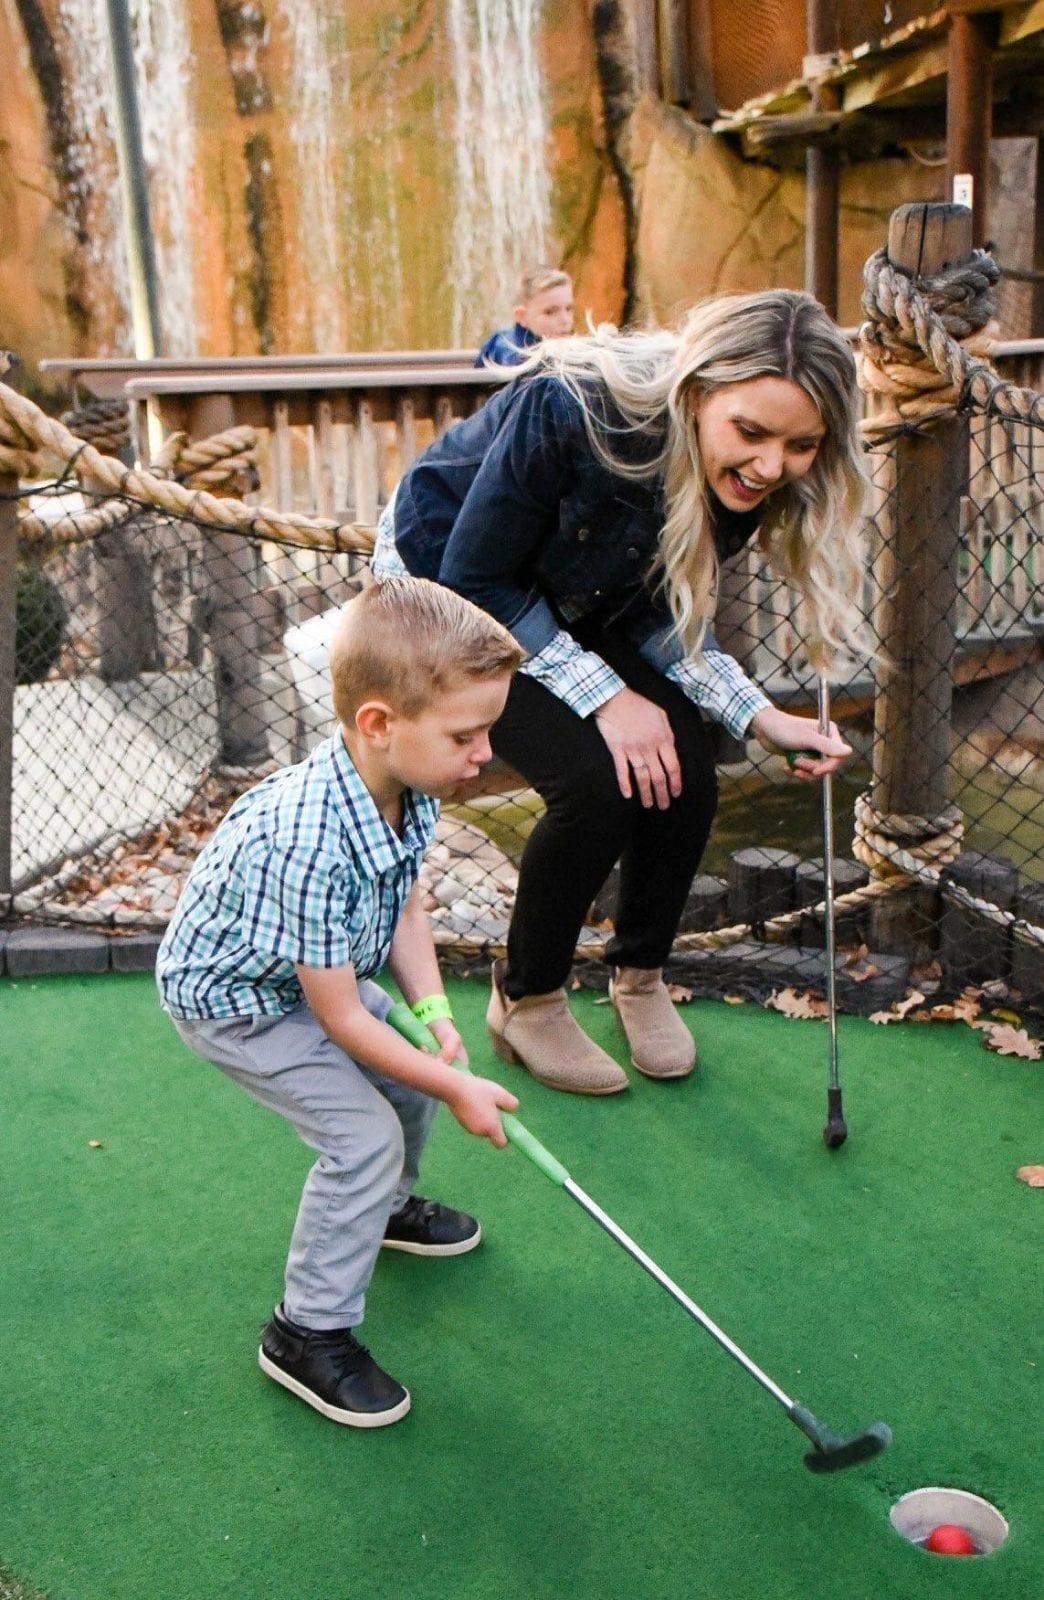 Miniature Golf Courses in Boondocks Fun Center, CO